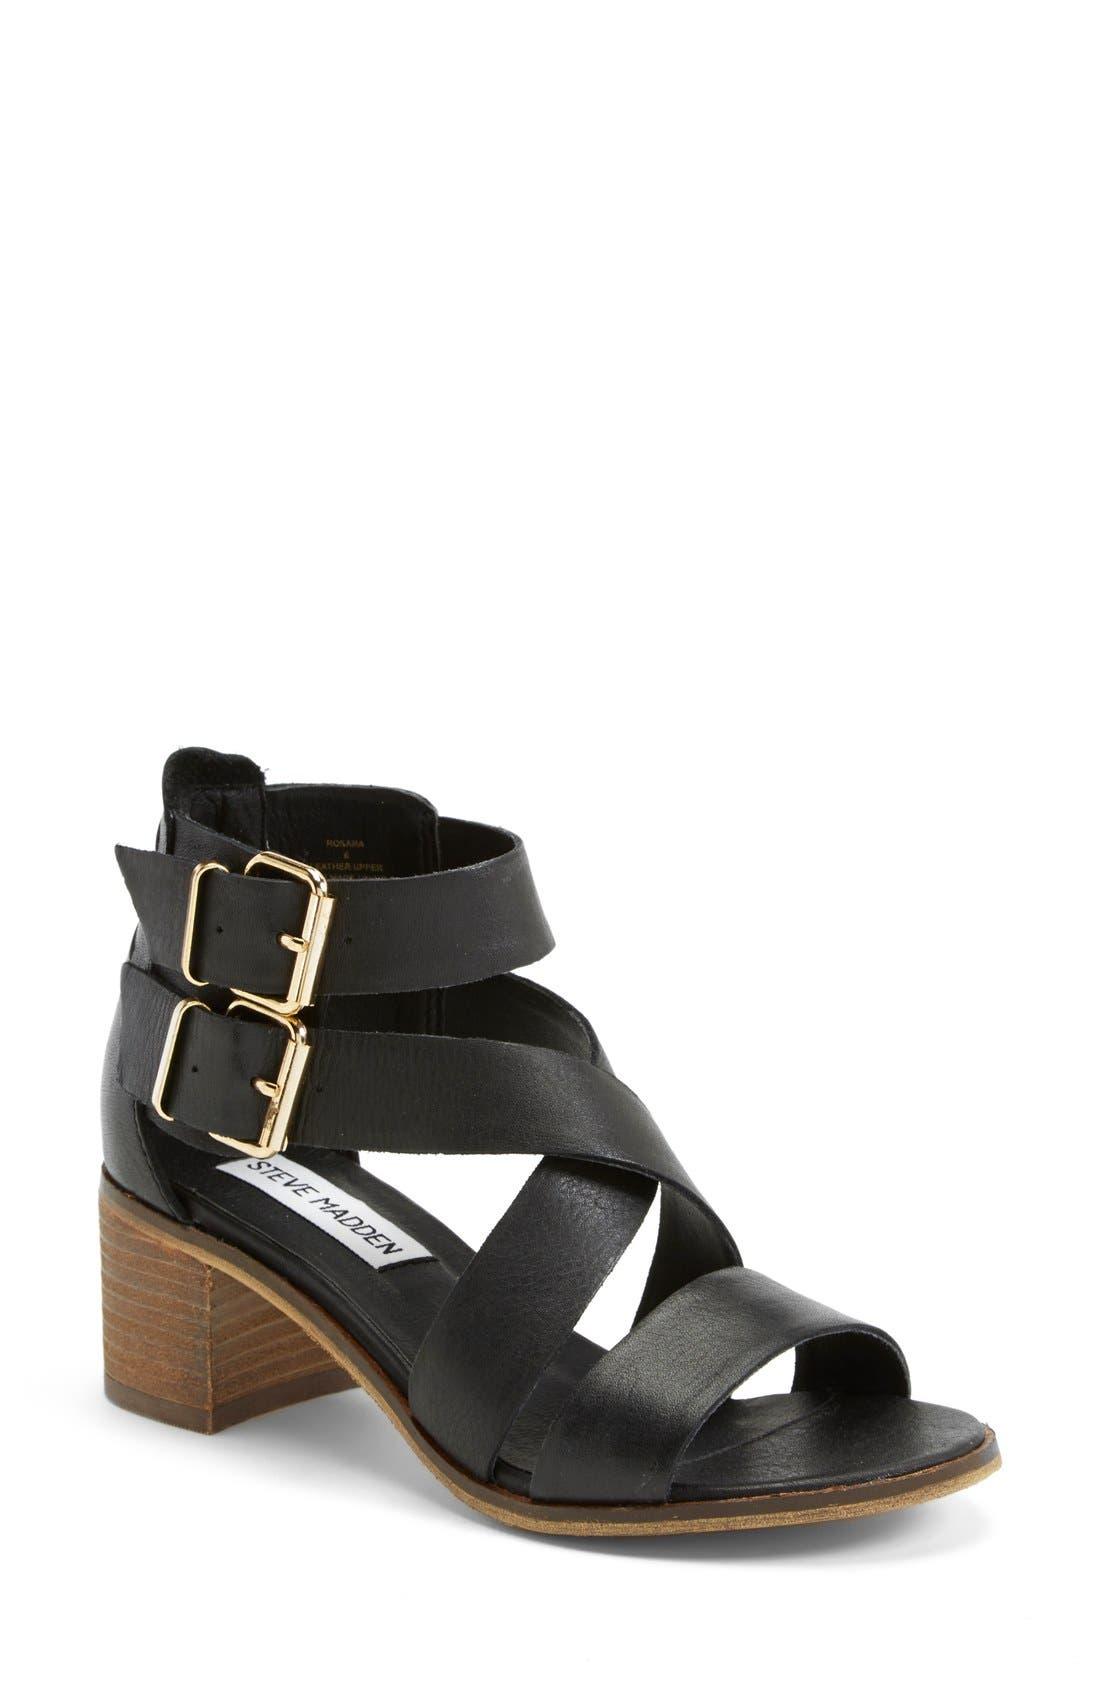 'Rosana' Double Ankle Strap Leather Sandal,                             Main thumbnail 1, color,                             001